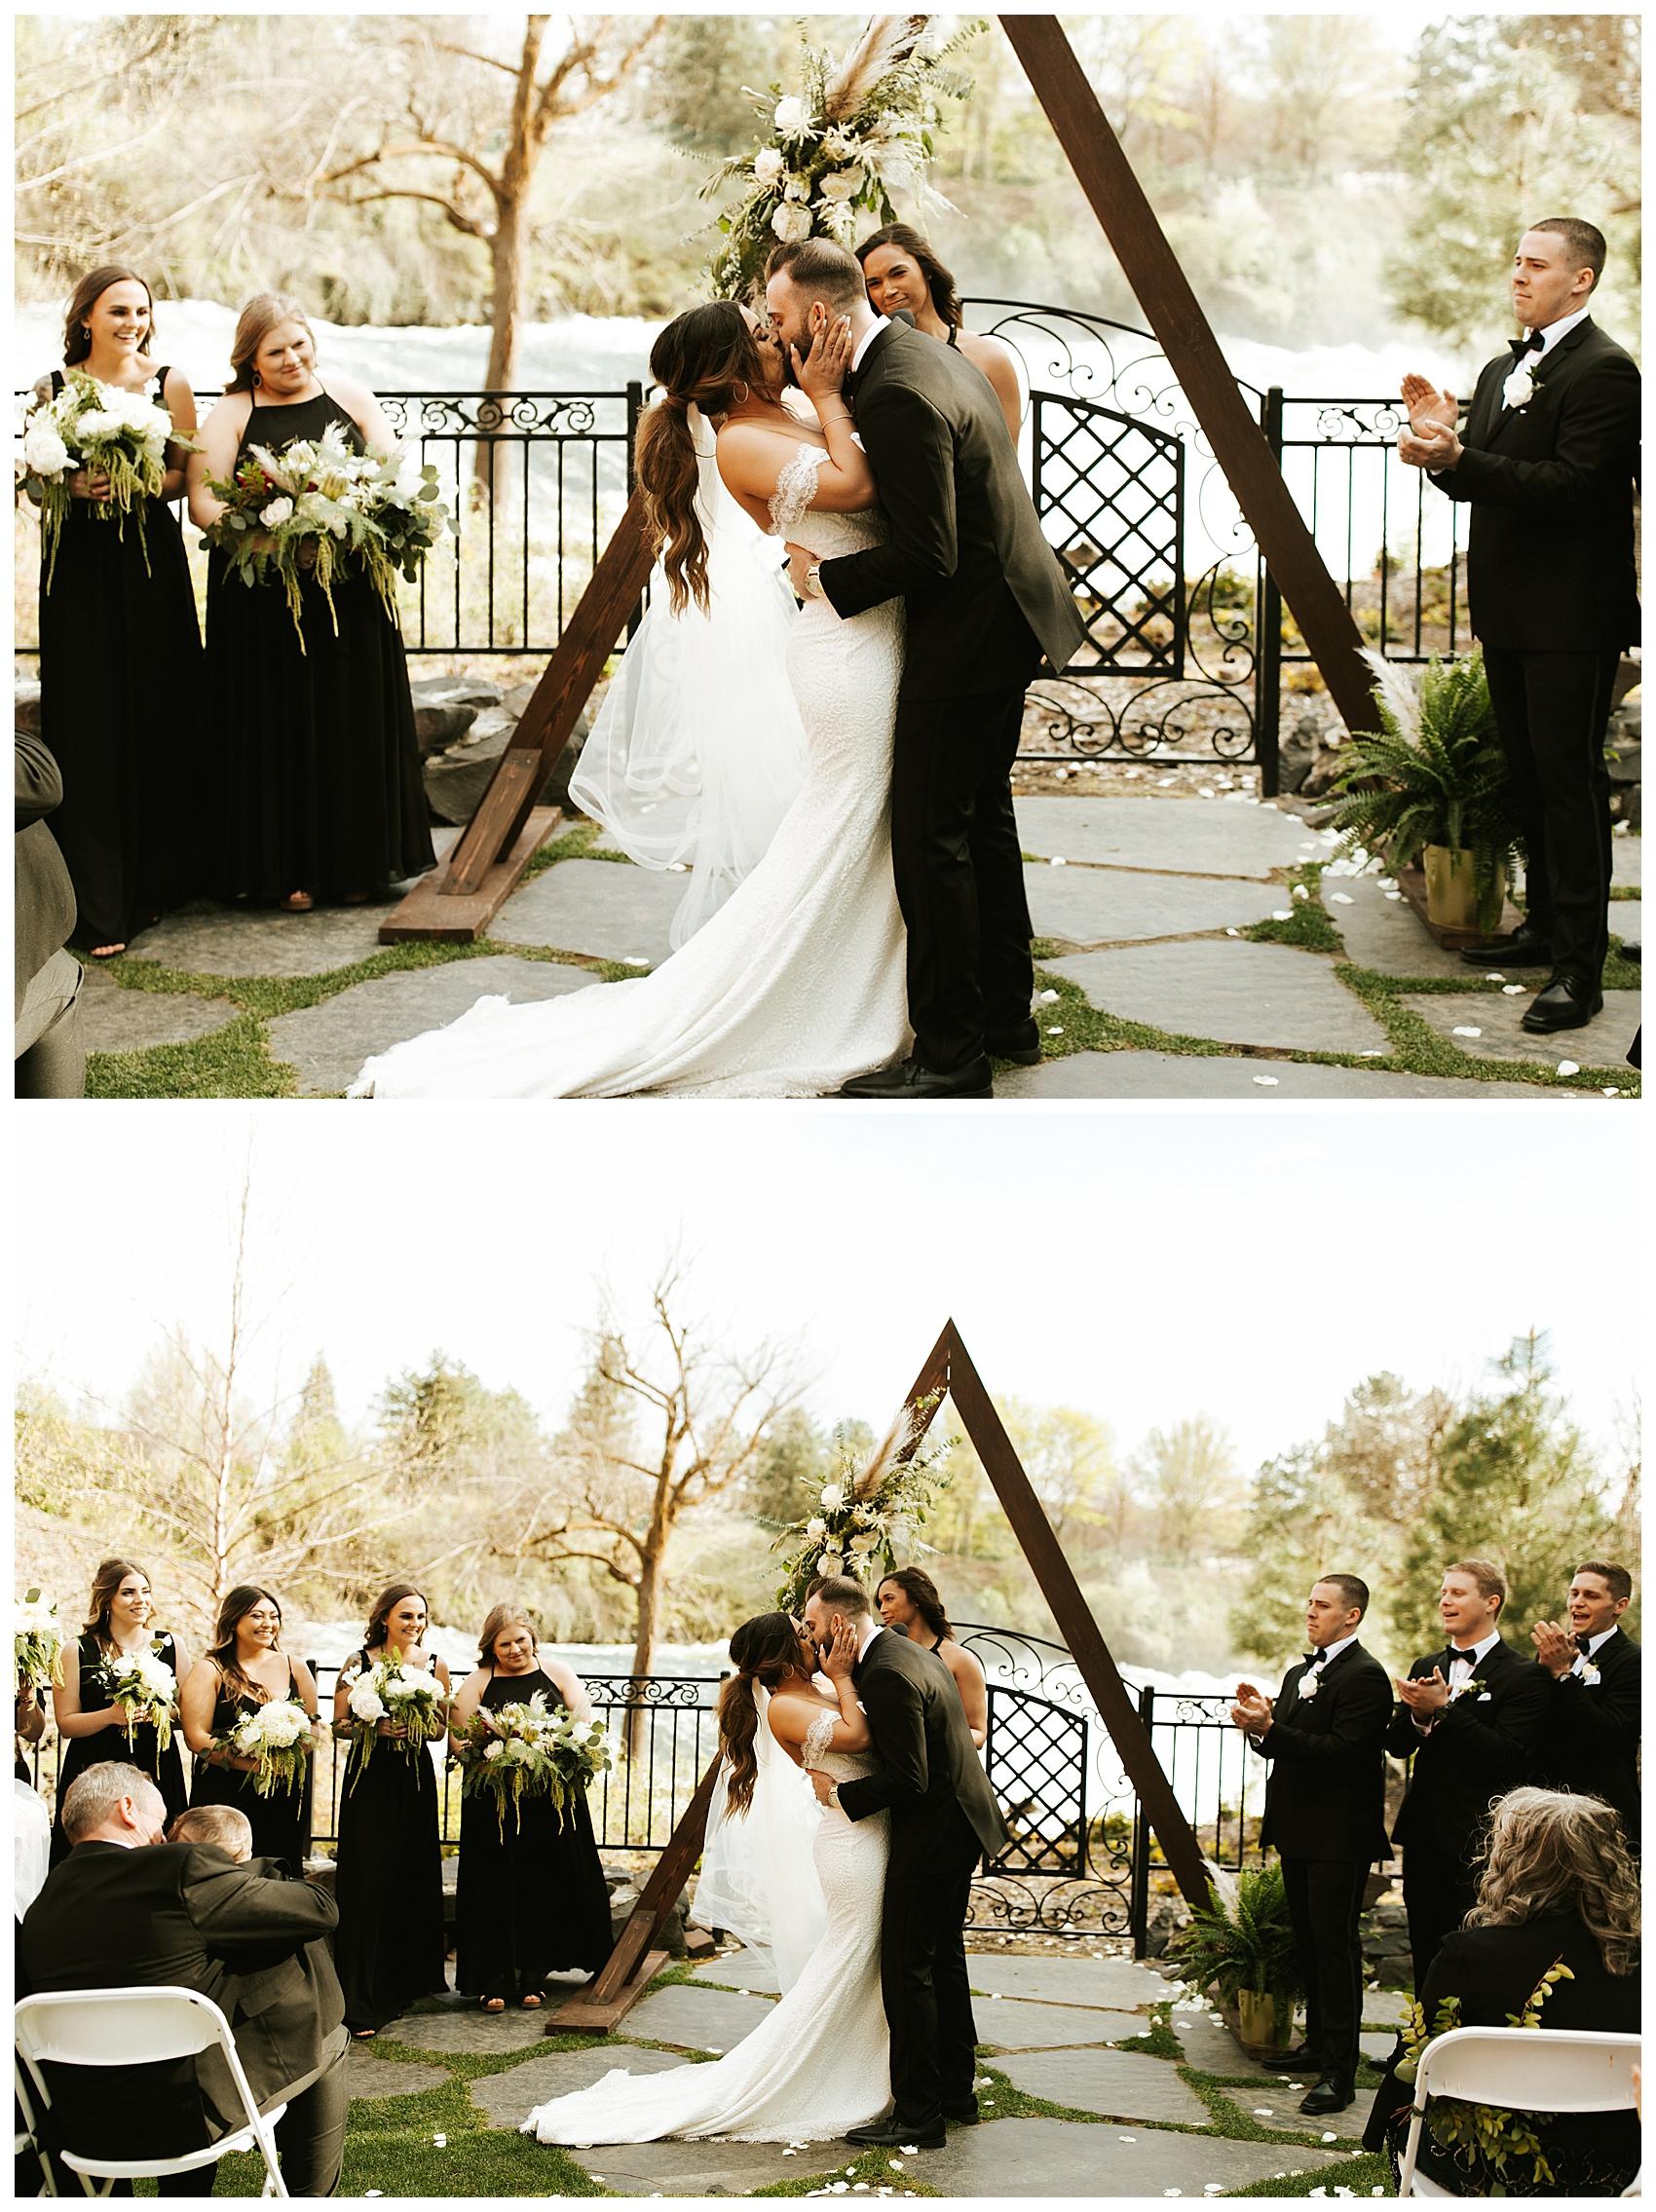 Chateau Rive Spokane Wedding Cassie Trottier Photography01060.jpg